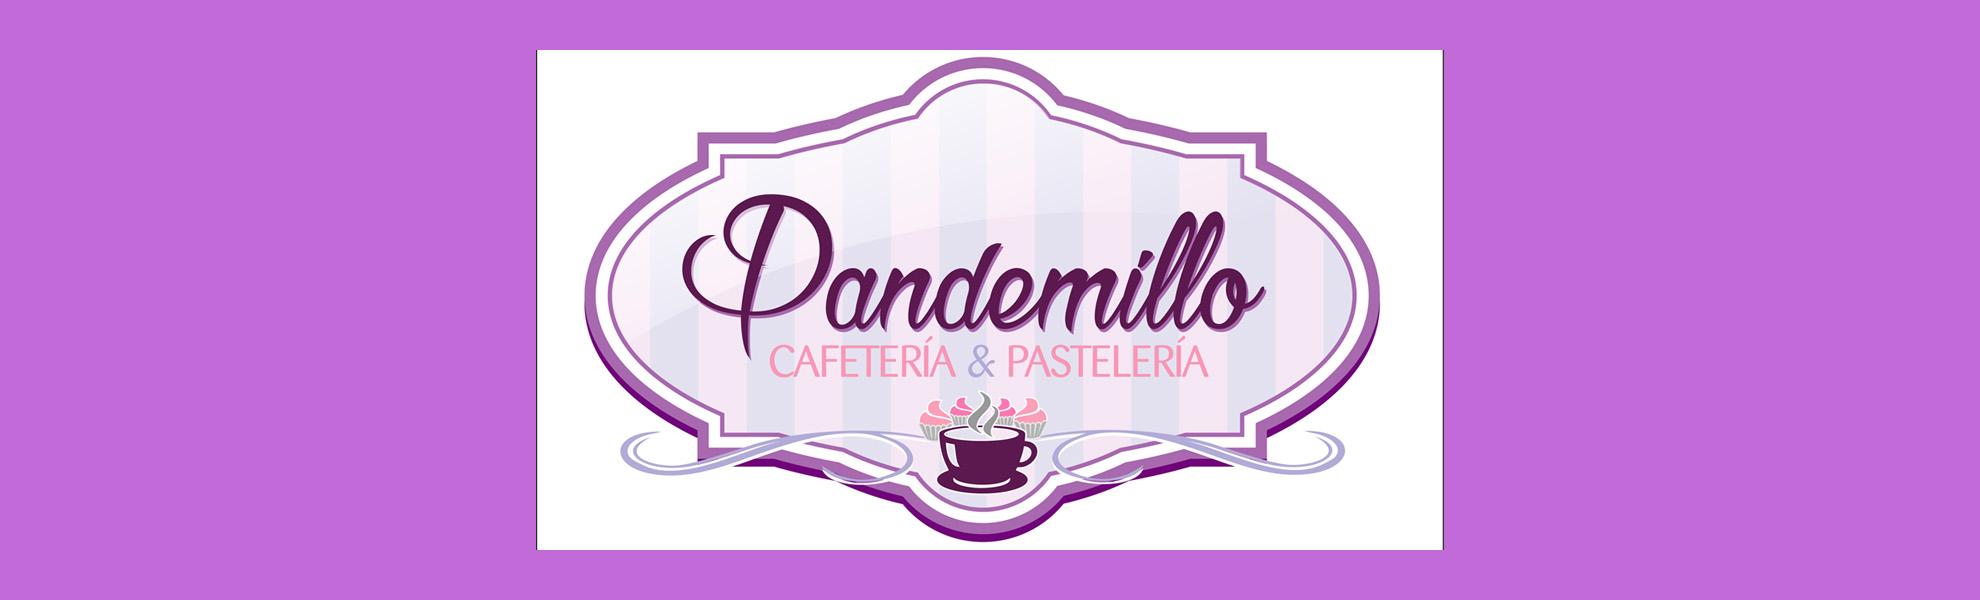 banner-PANDEMILLO